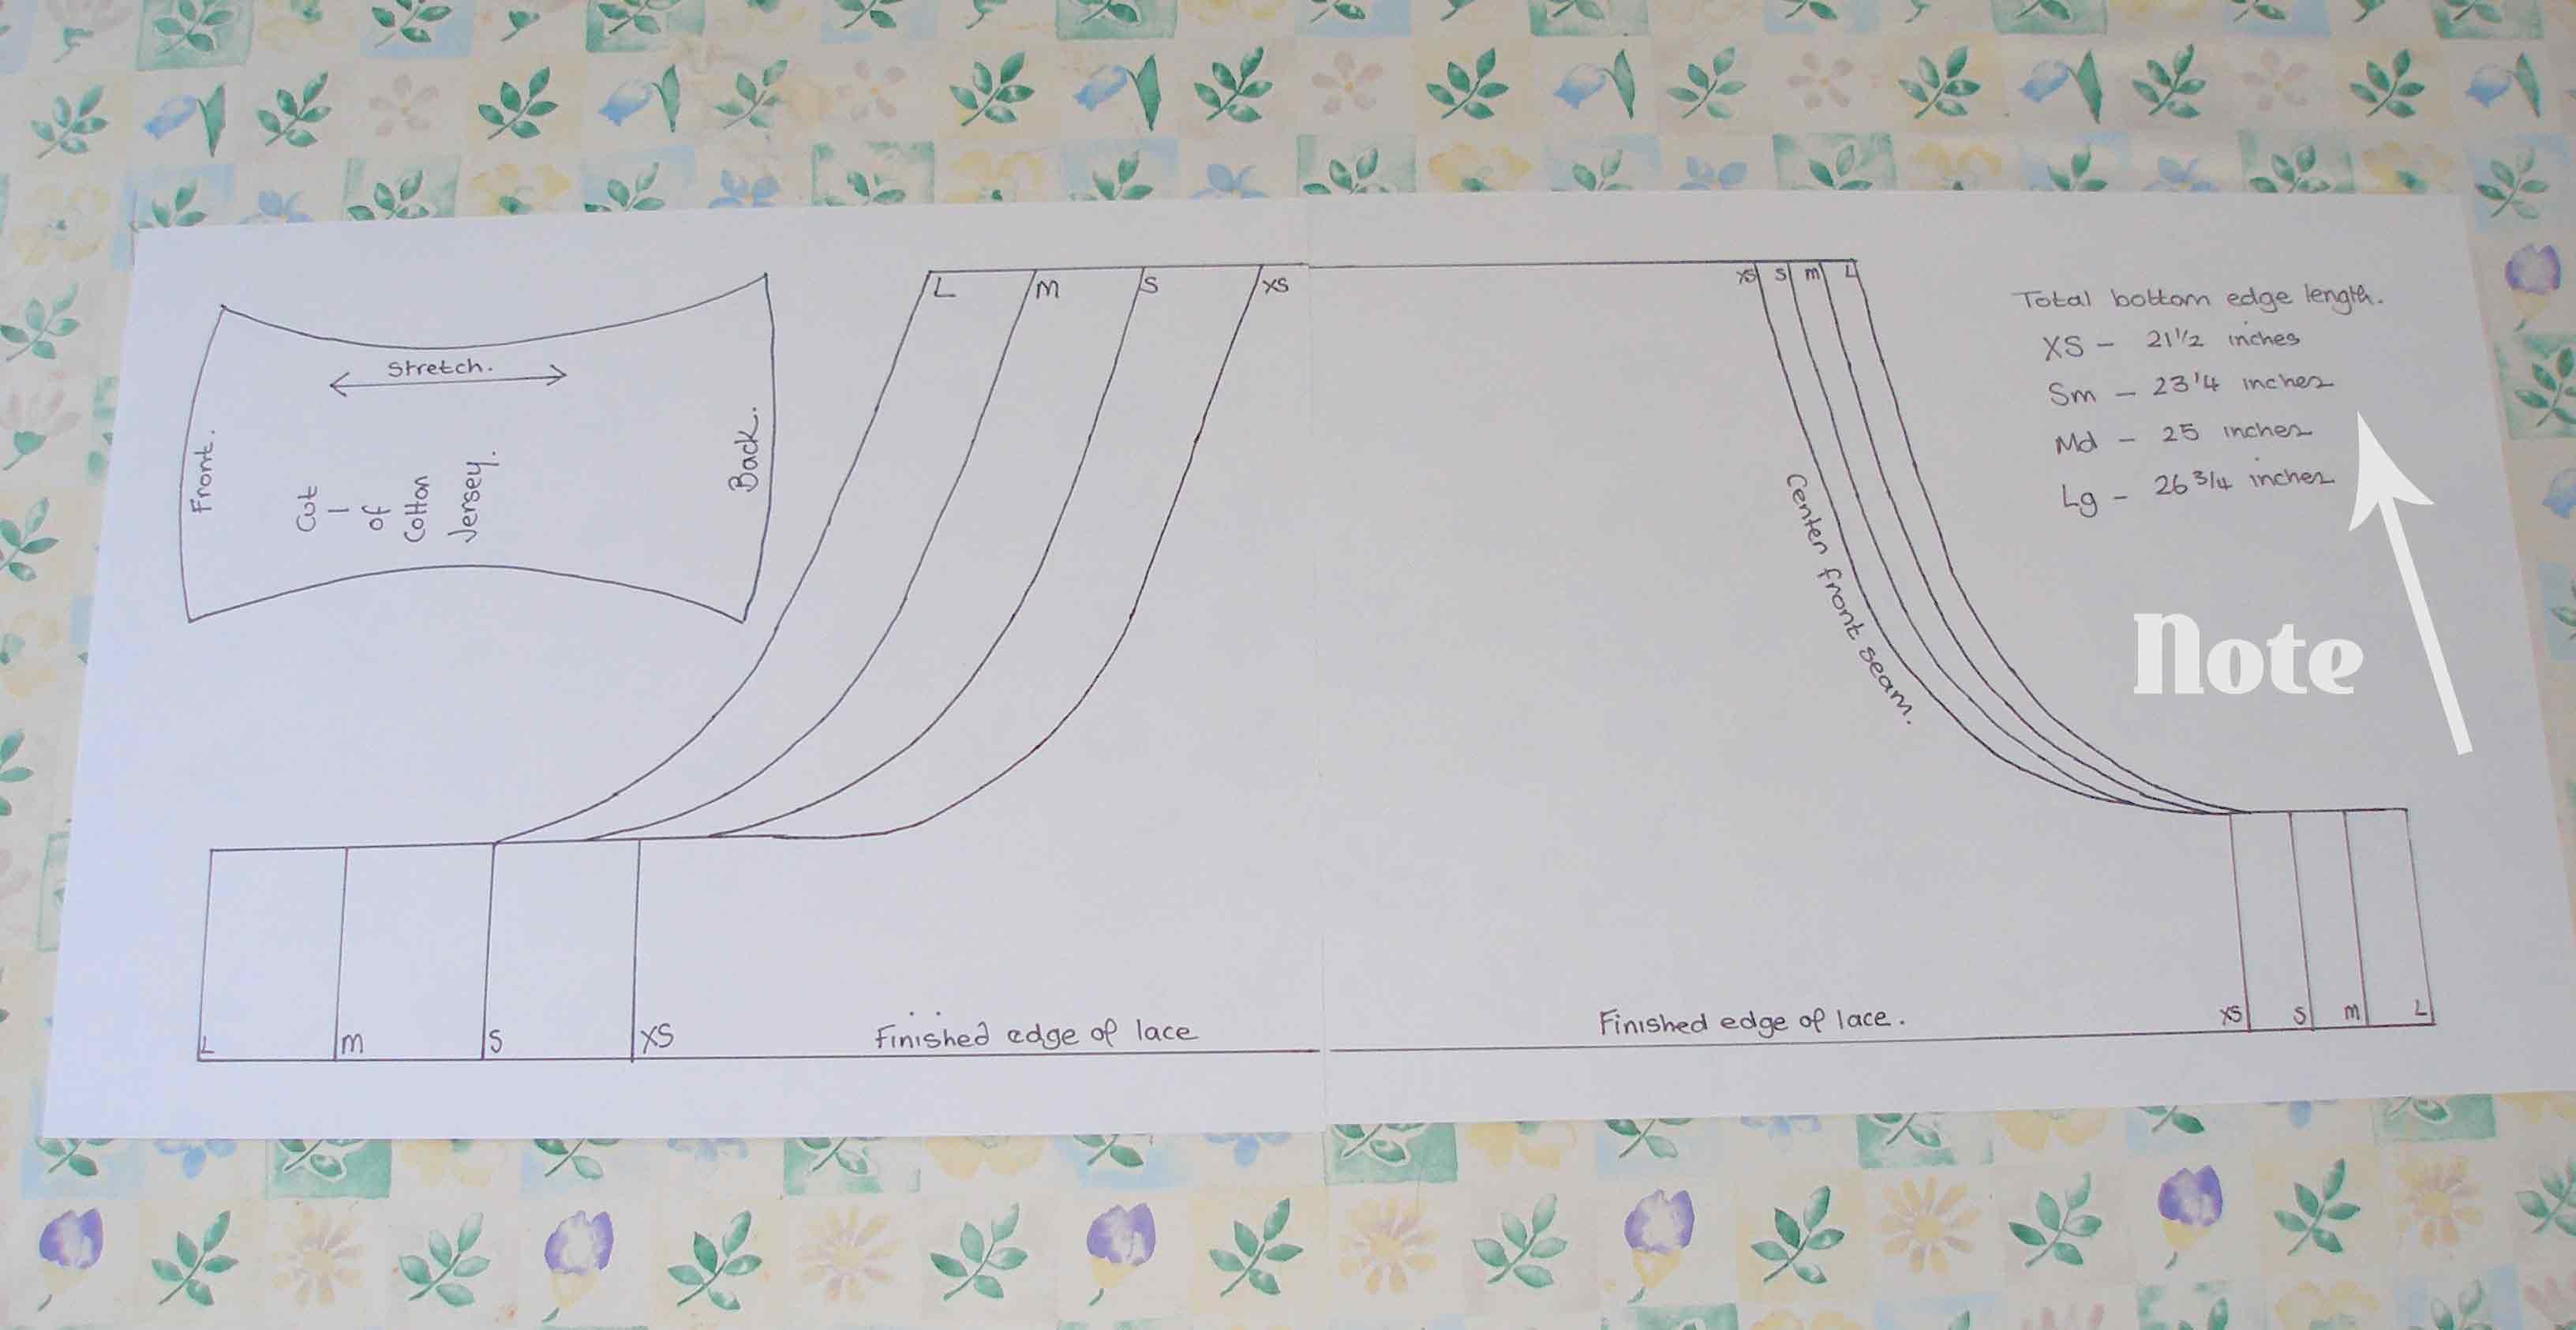 Free undies pattern – making up the pattern